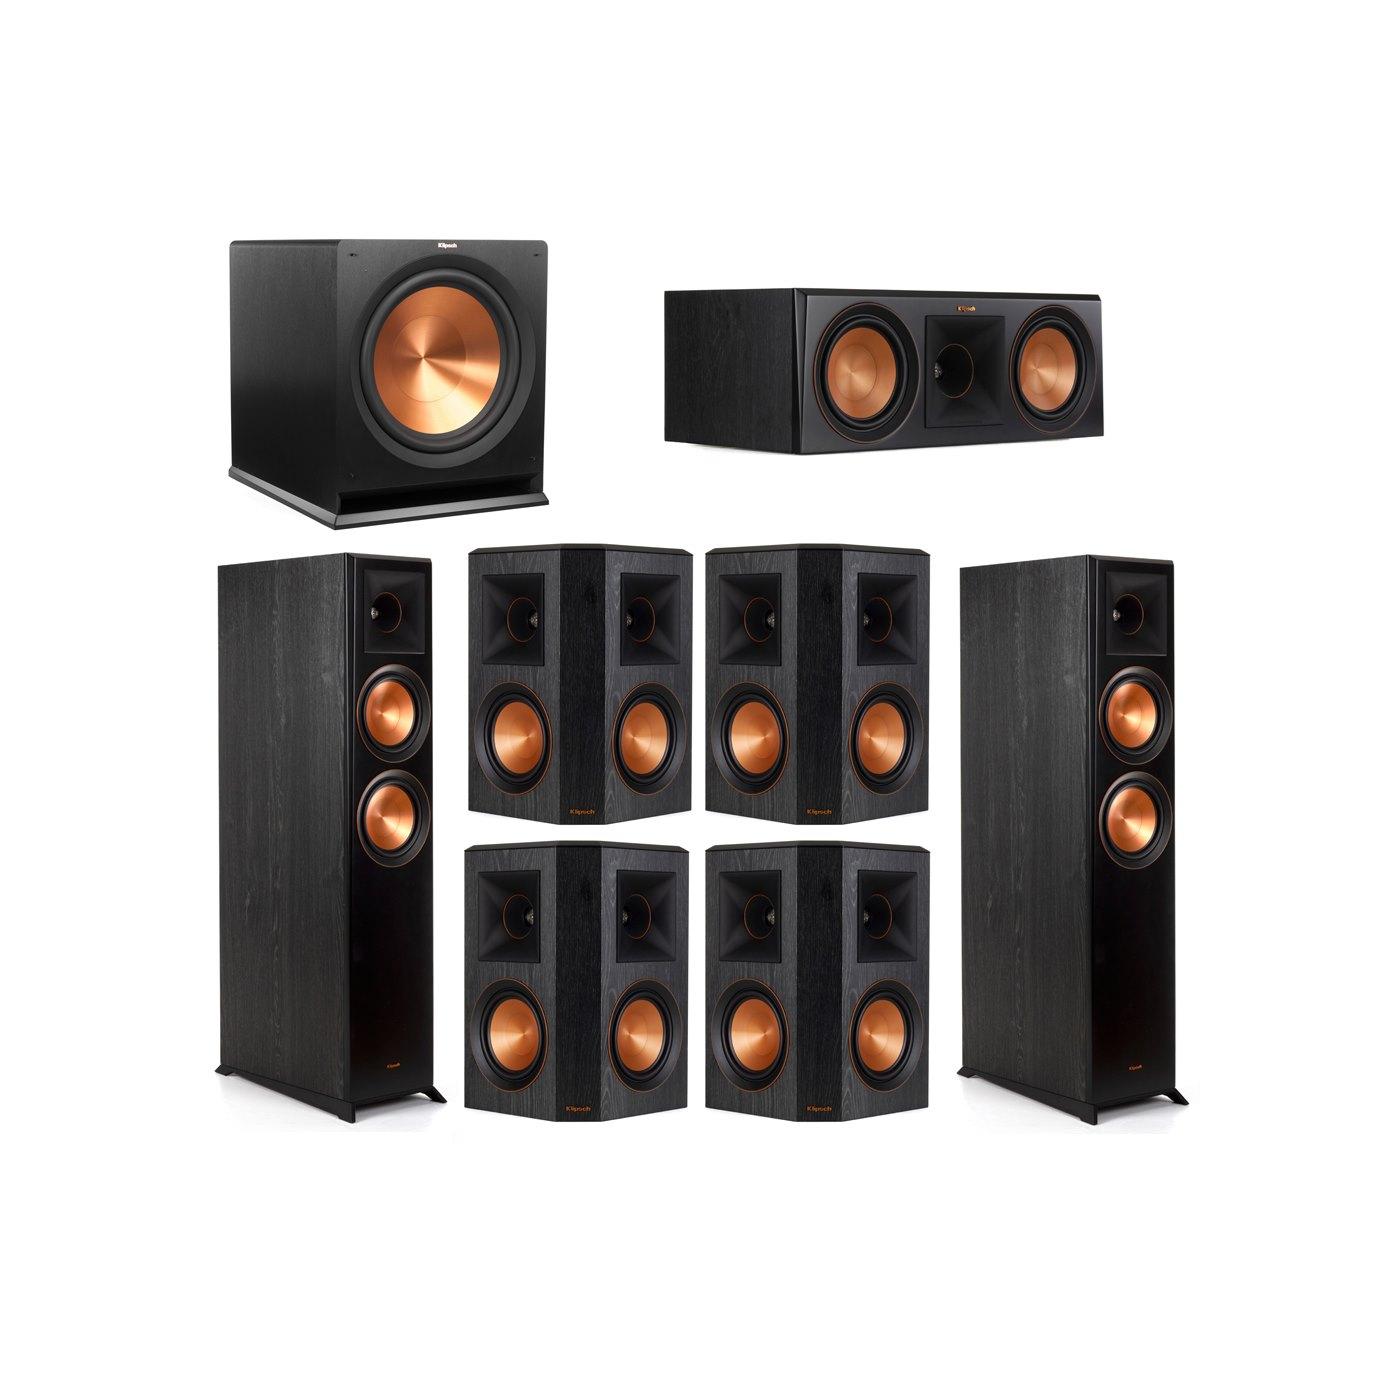 Klipsch 7.1 System with 2 RP-6000F Floorstanding Speakers, 1 Klipsch RP-600C Center Speaker, 4 Klipsch RP-502S Surround Speakers, 1 Klipsch R-115SW Subwoofer